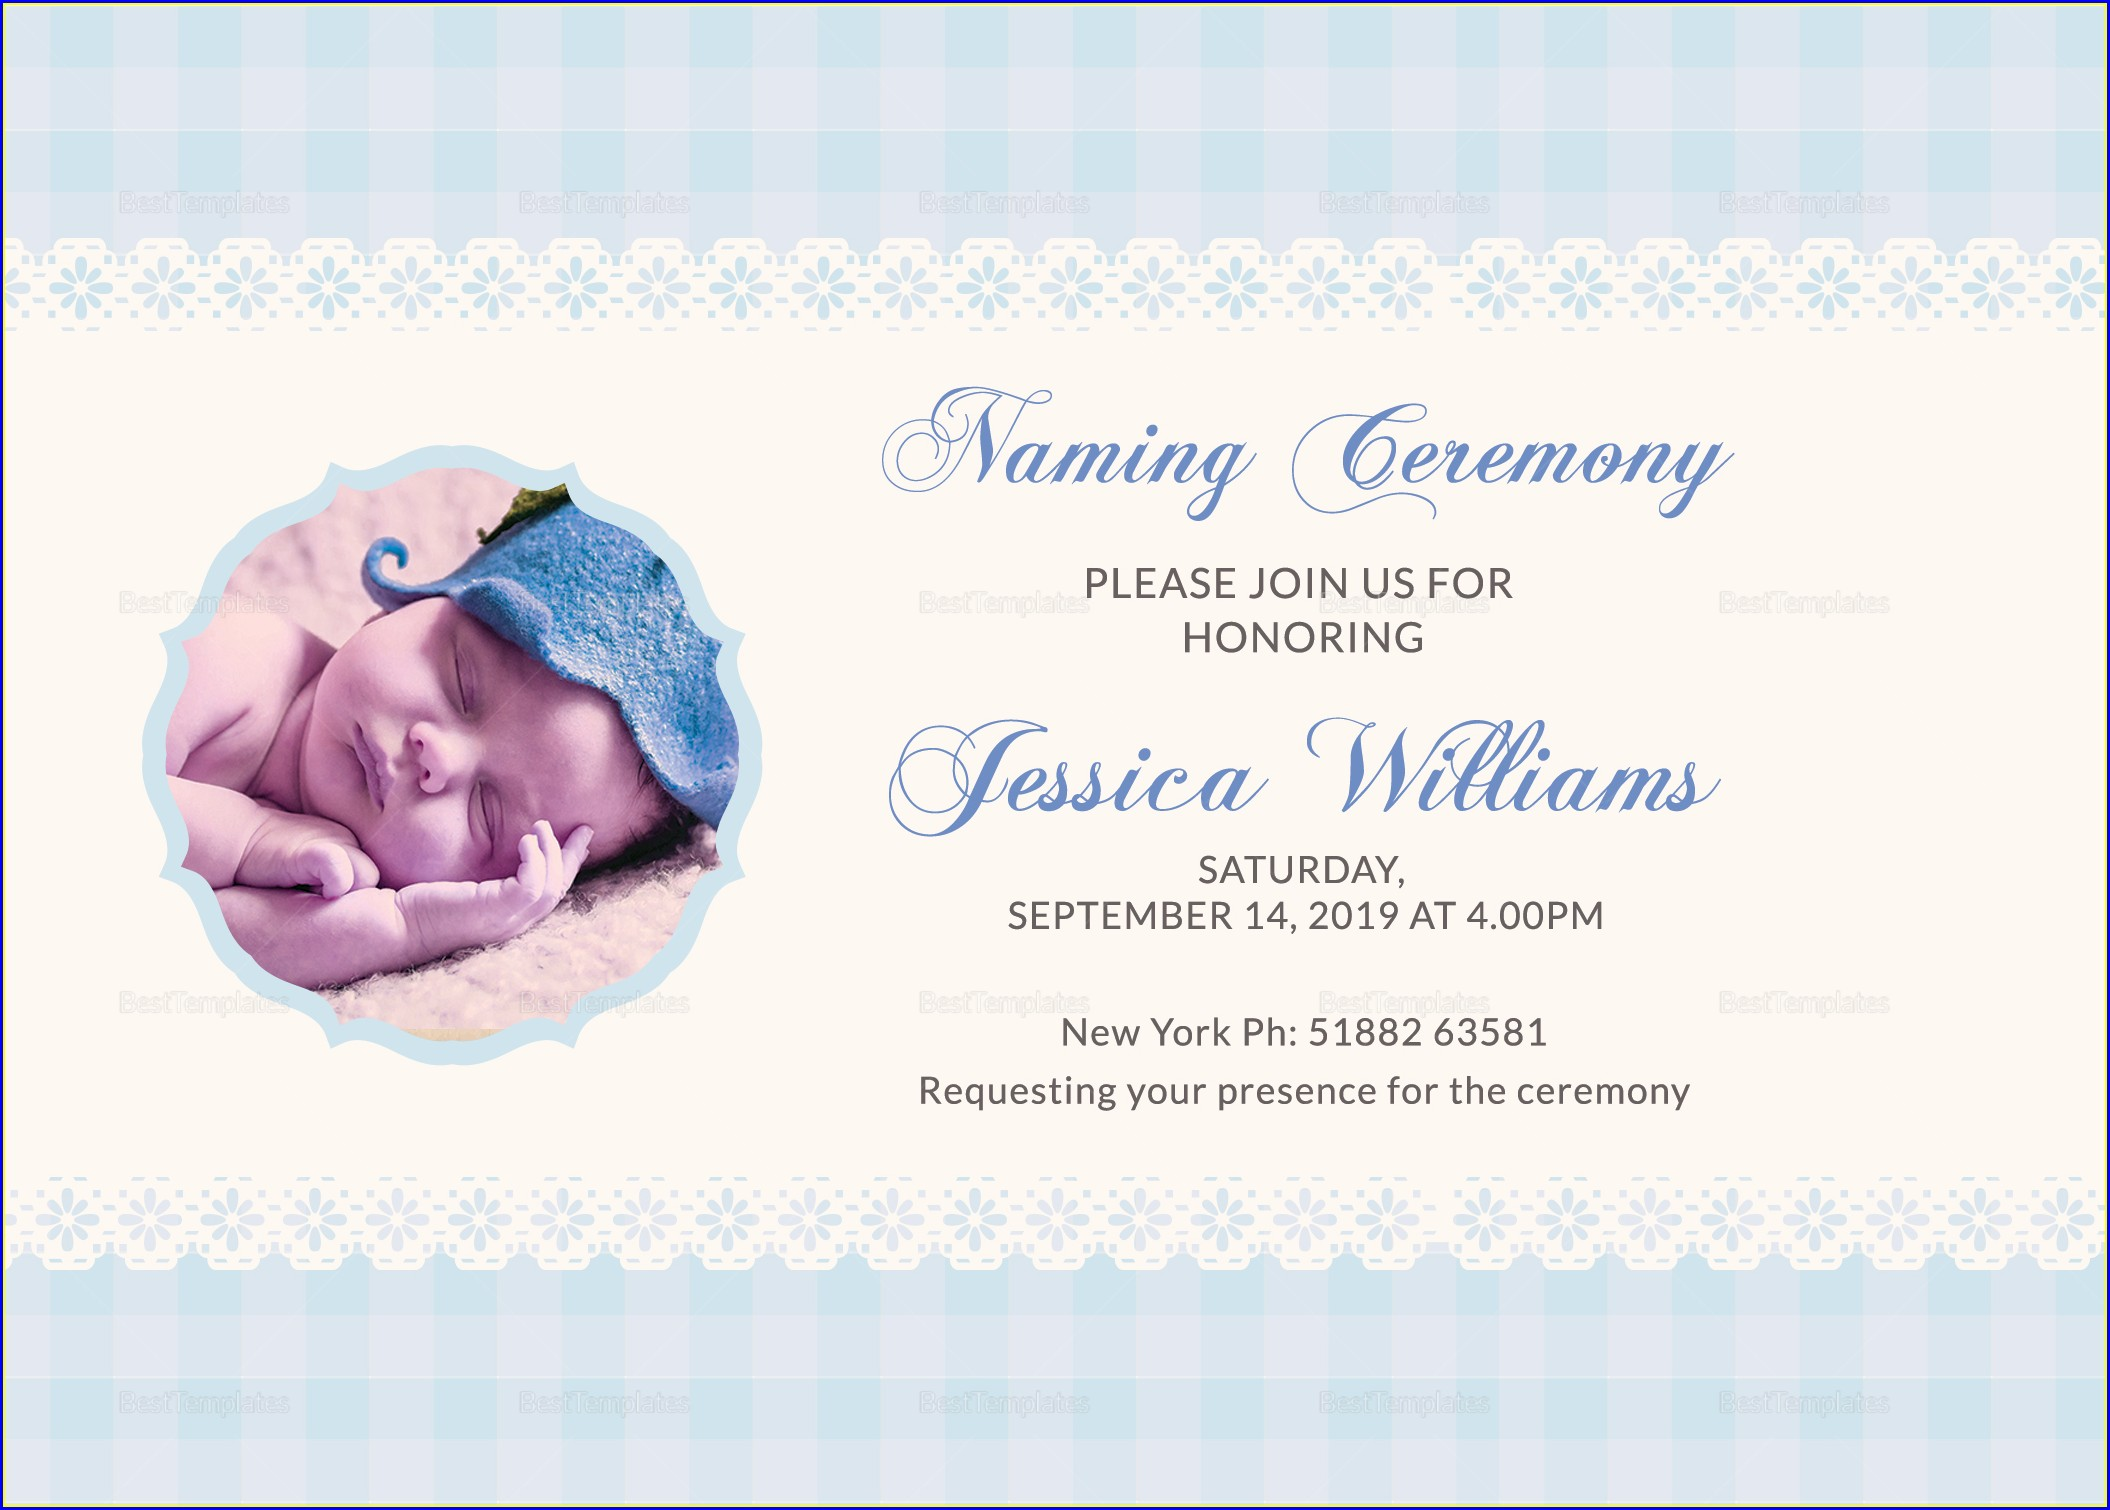 Baby Naming Ceremony Invitation Card Design